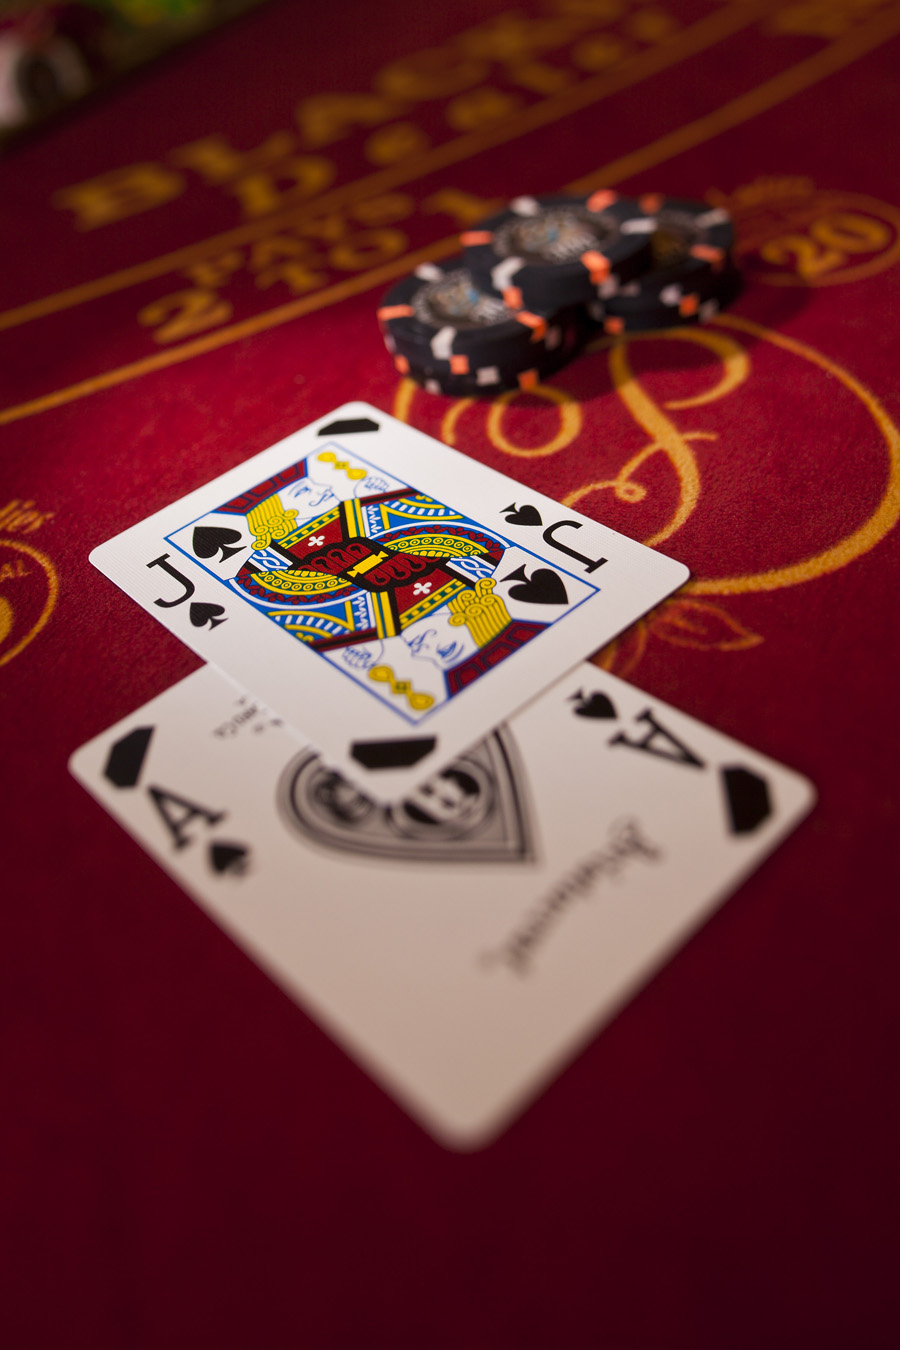 Blackjack en ligne : apprenez à compter les cartes !